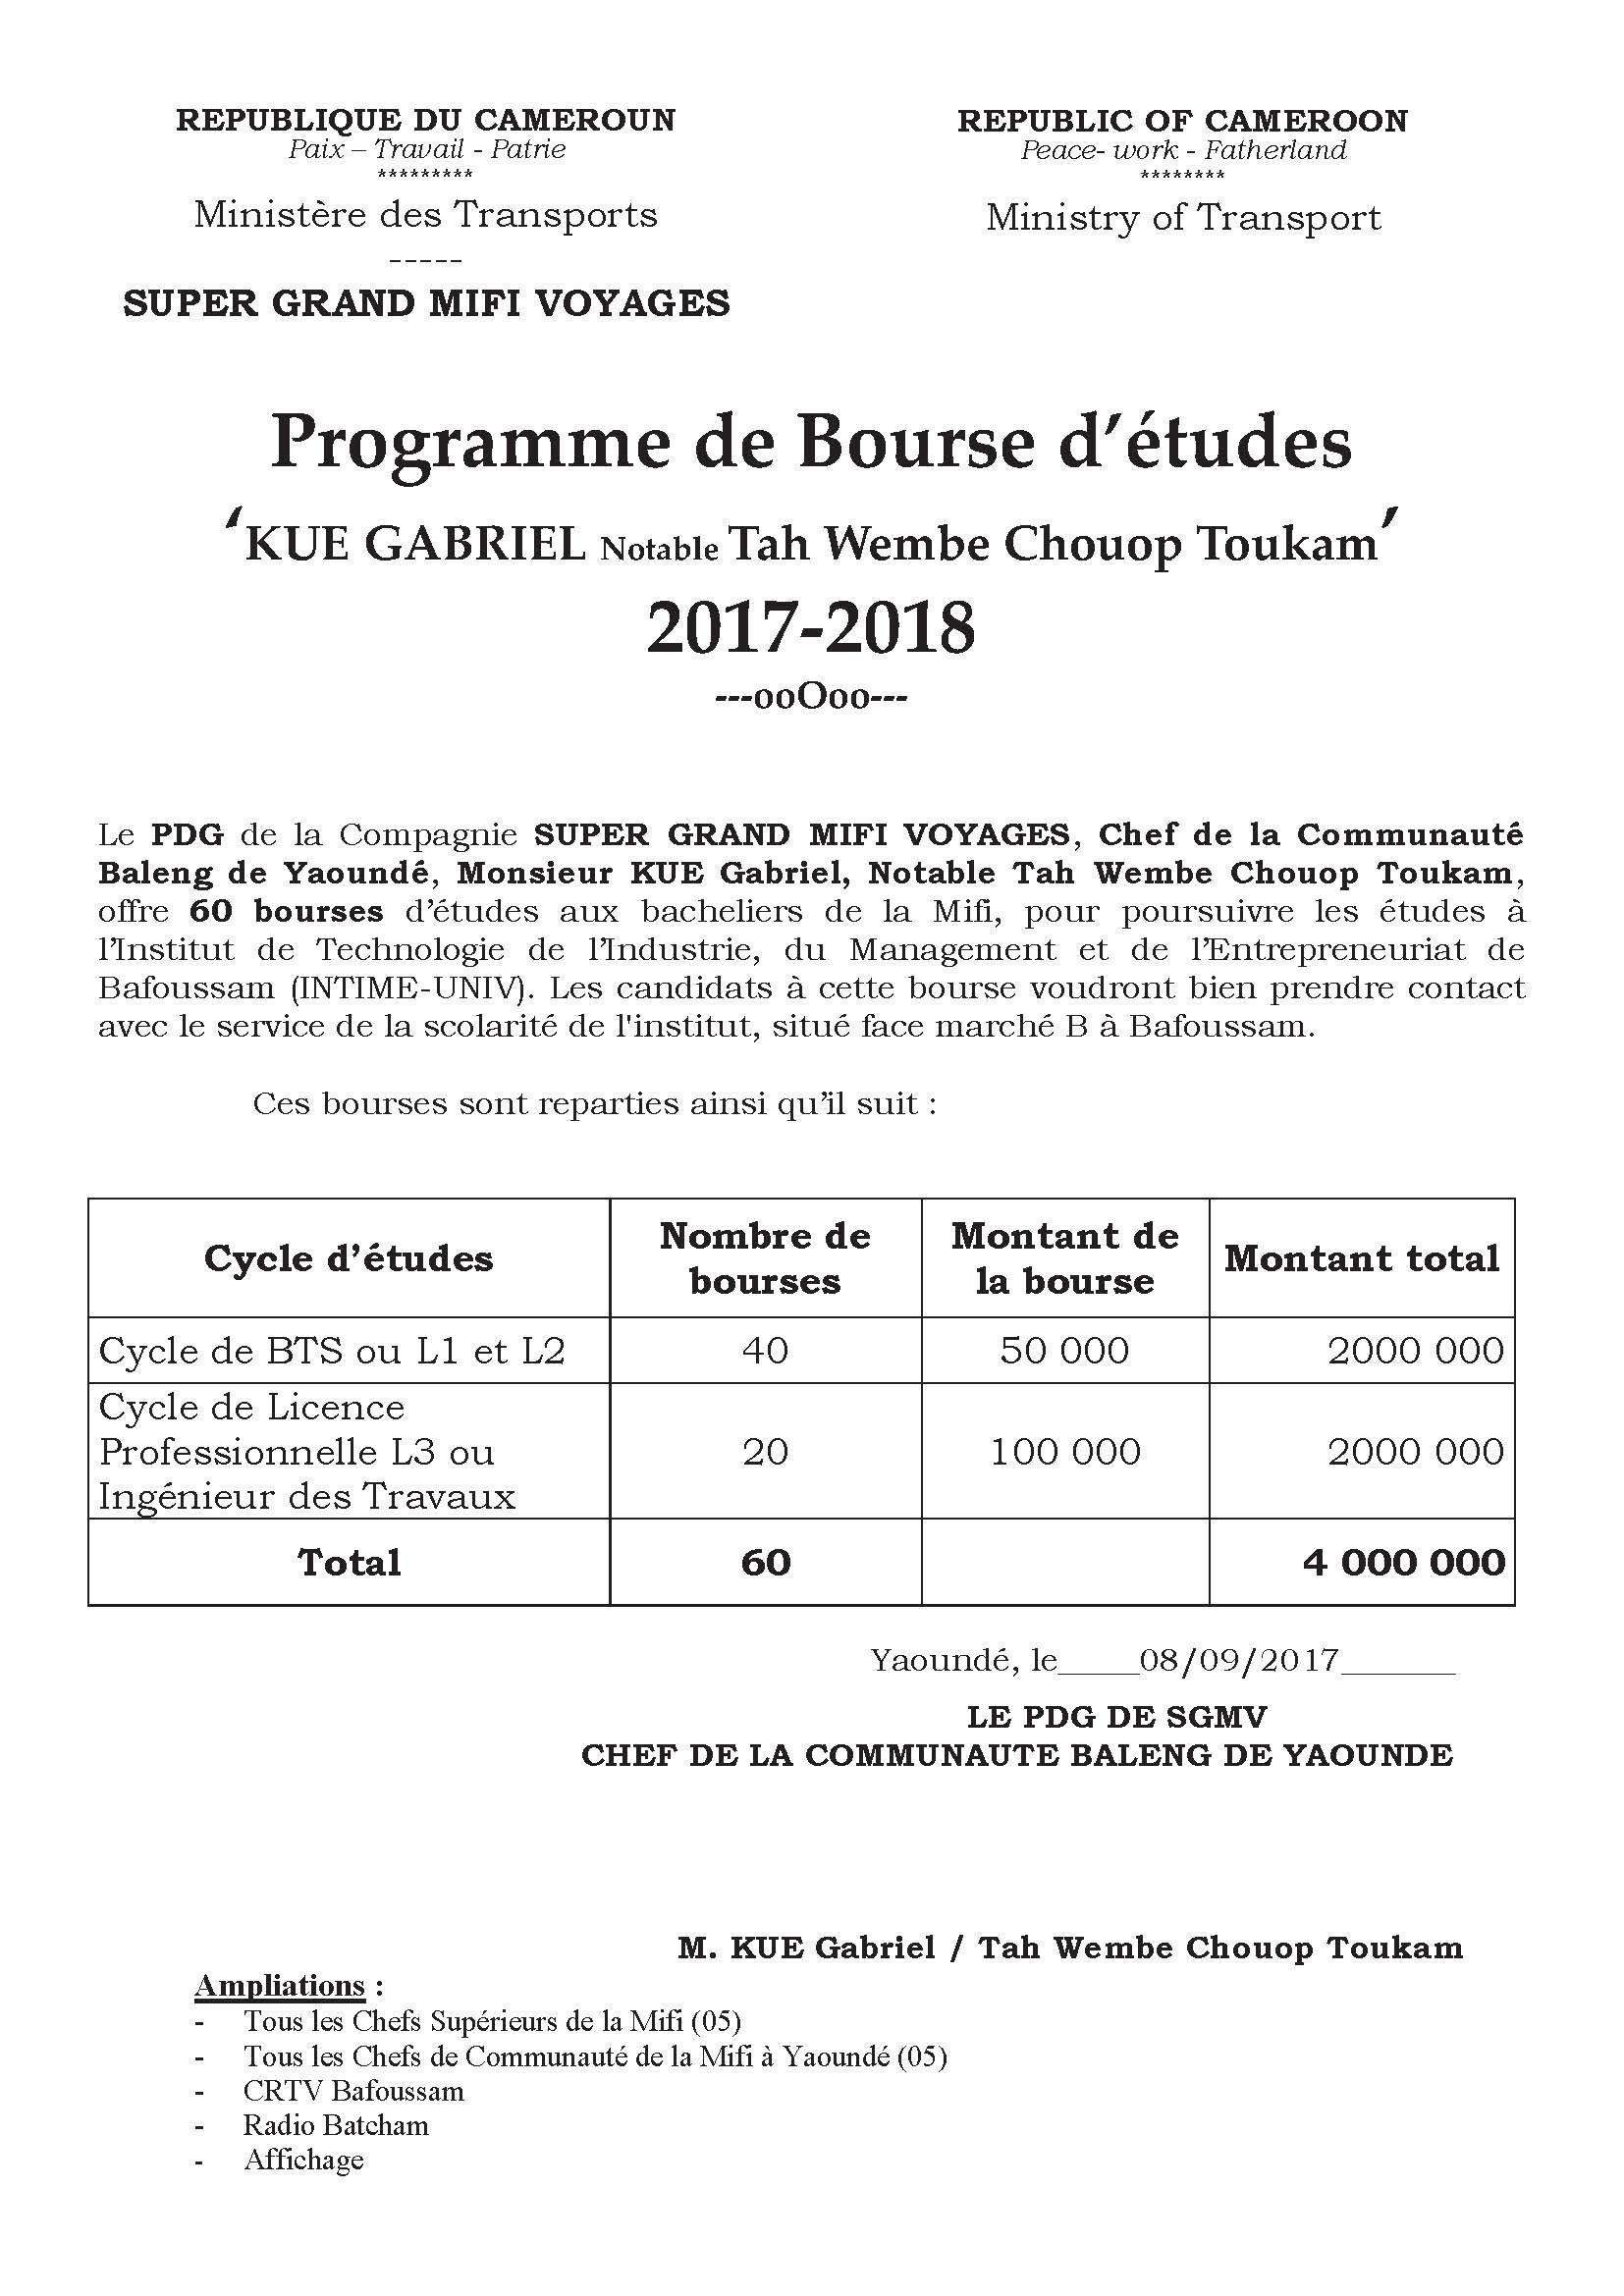 Bourse KUE GABRIEL